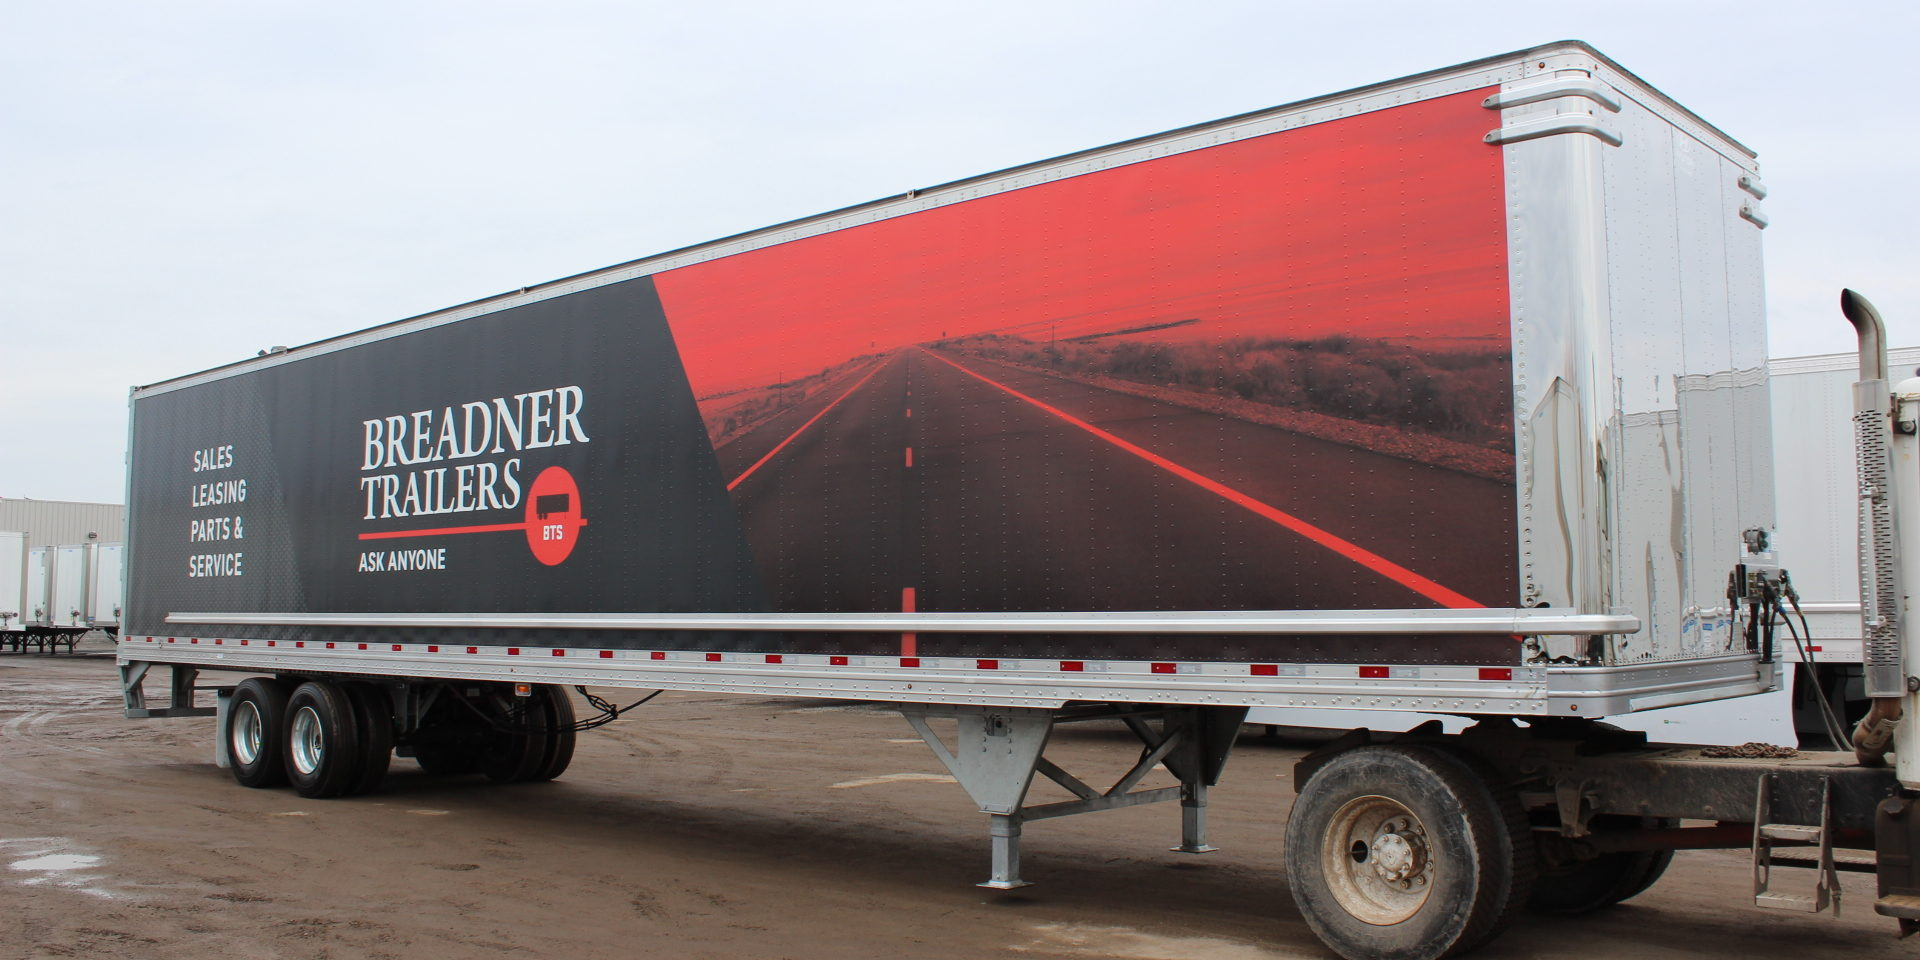 Breadner Trailer Sales Becomes Exclusive Dealer Breadner Trailers